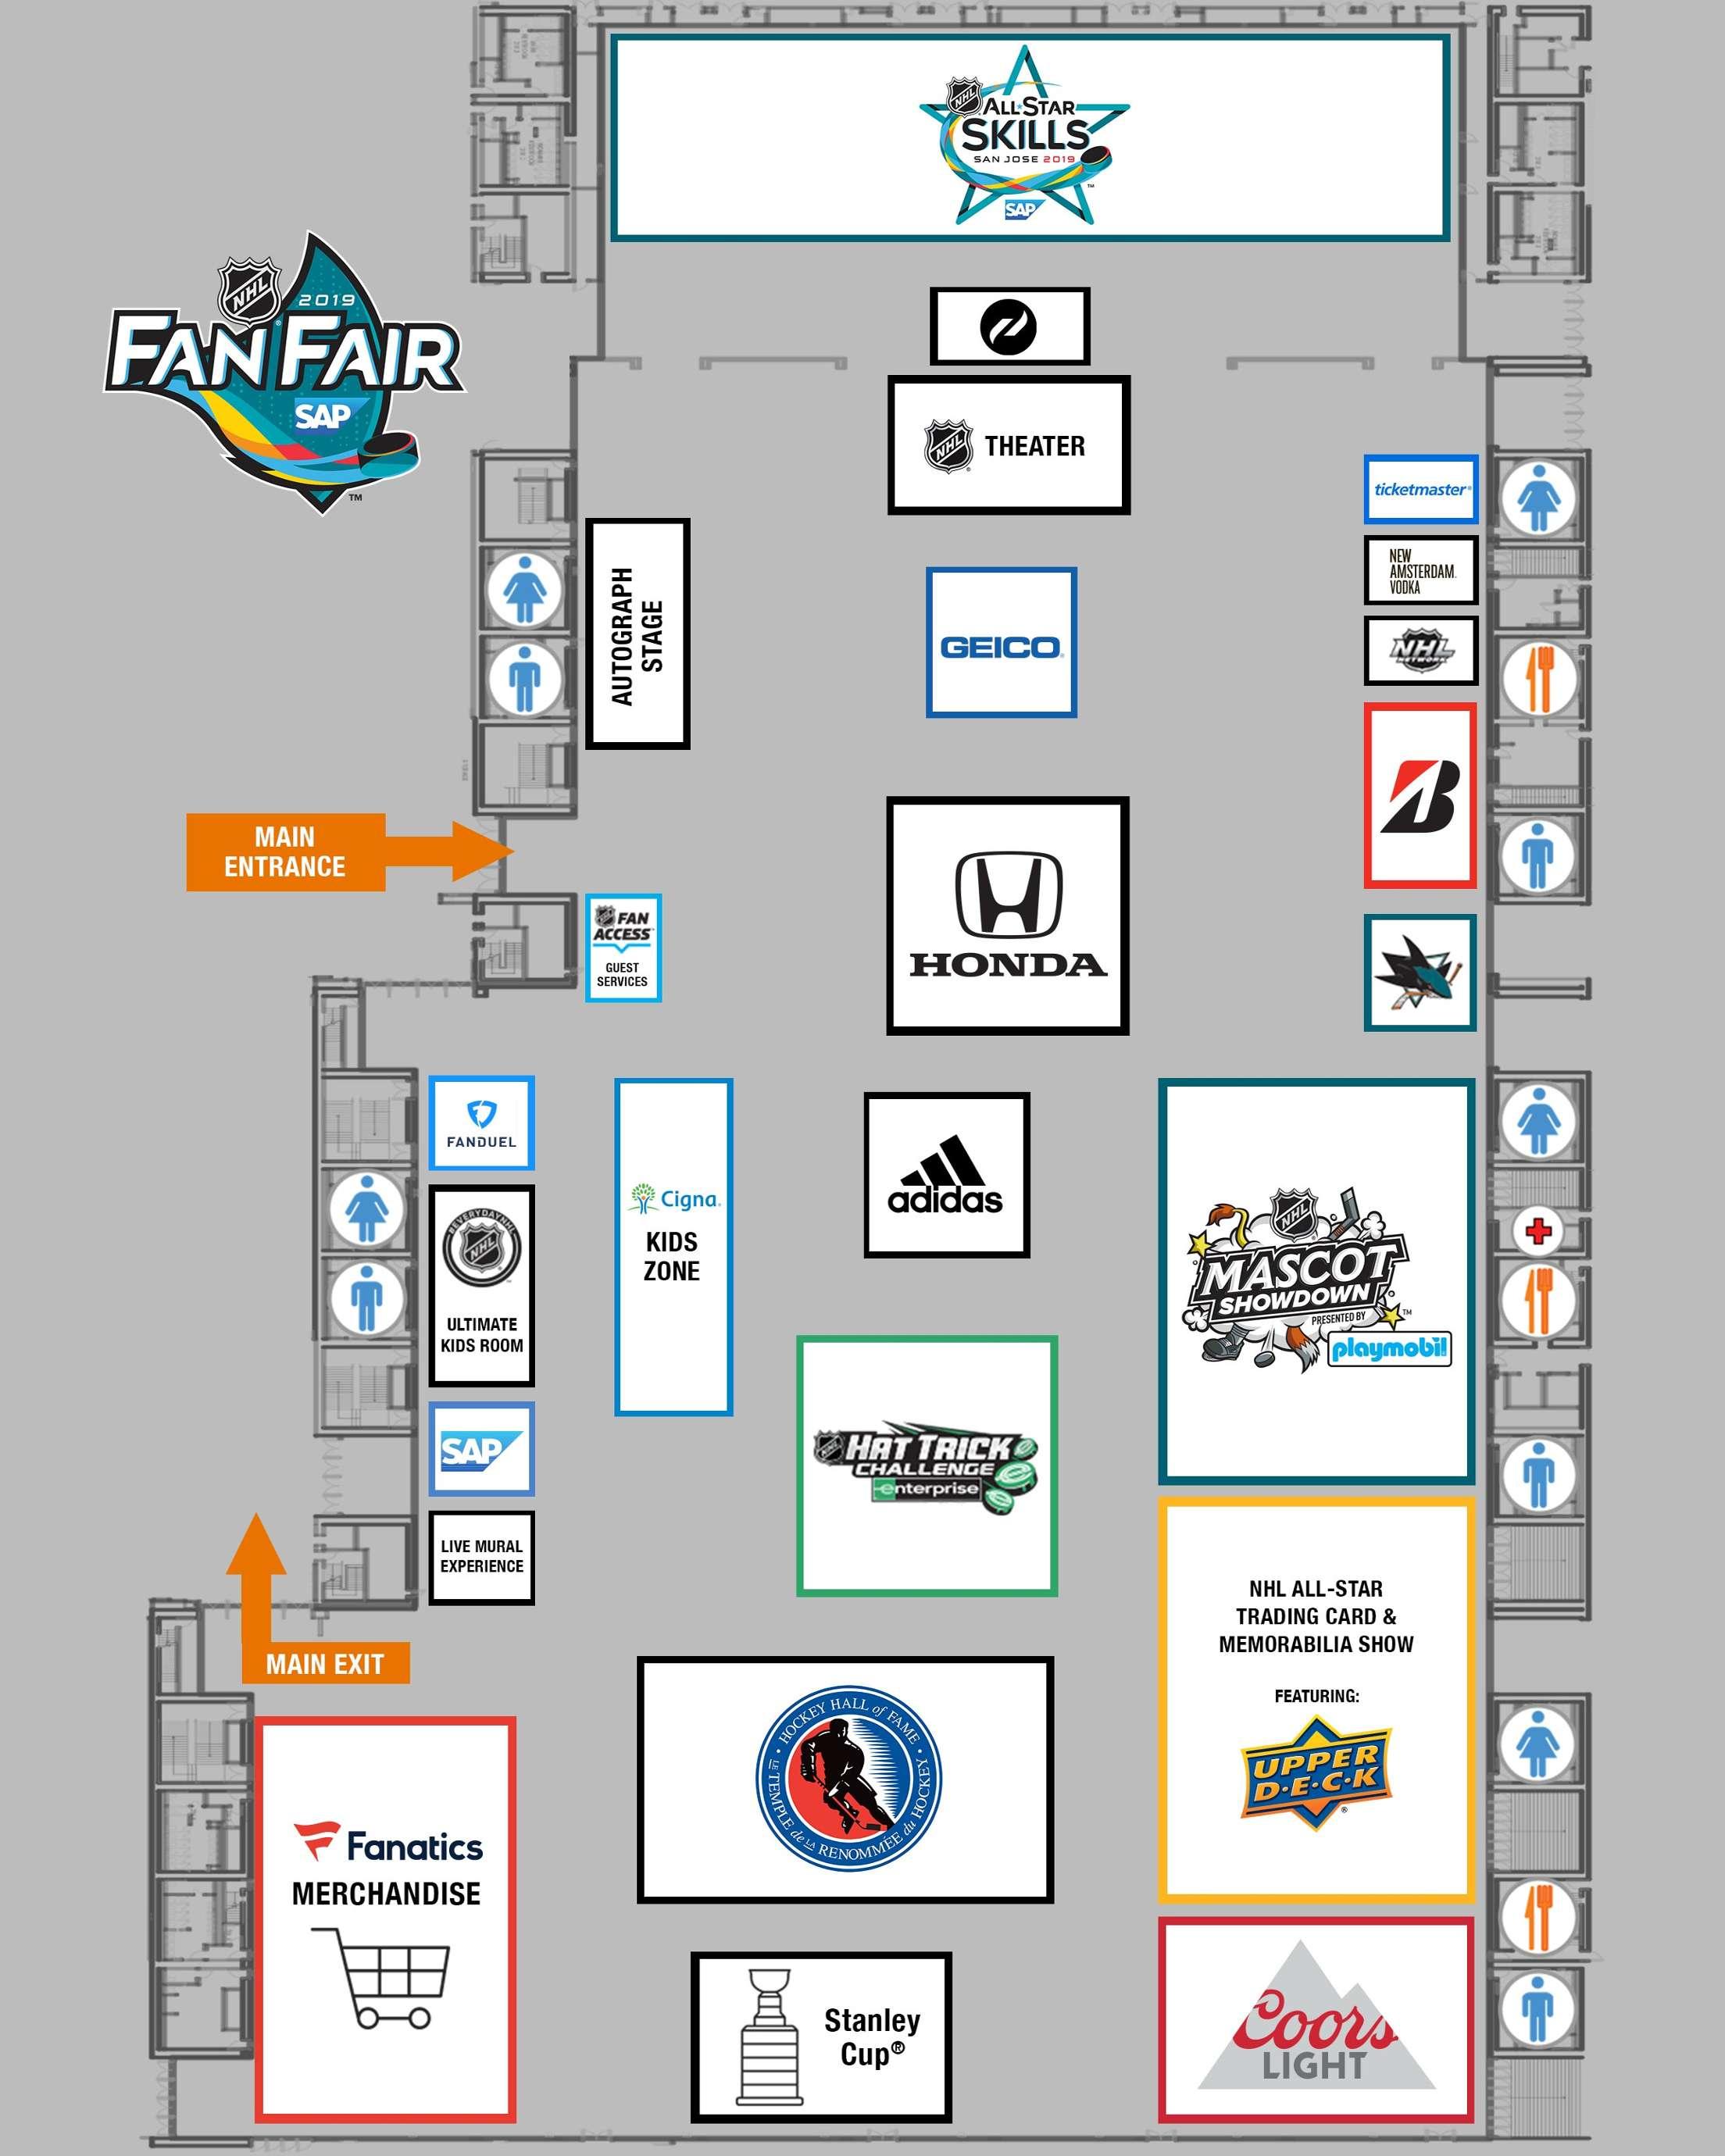 2019 Nhl Fan Fair | Nhl Pertaining To San Jose Conventions Center Calendar